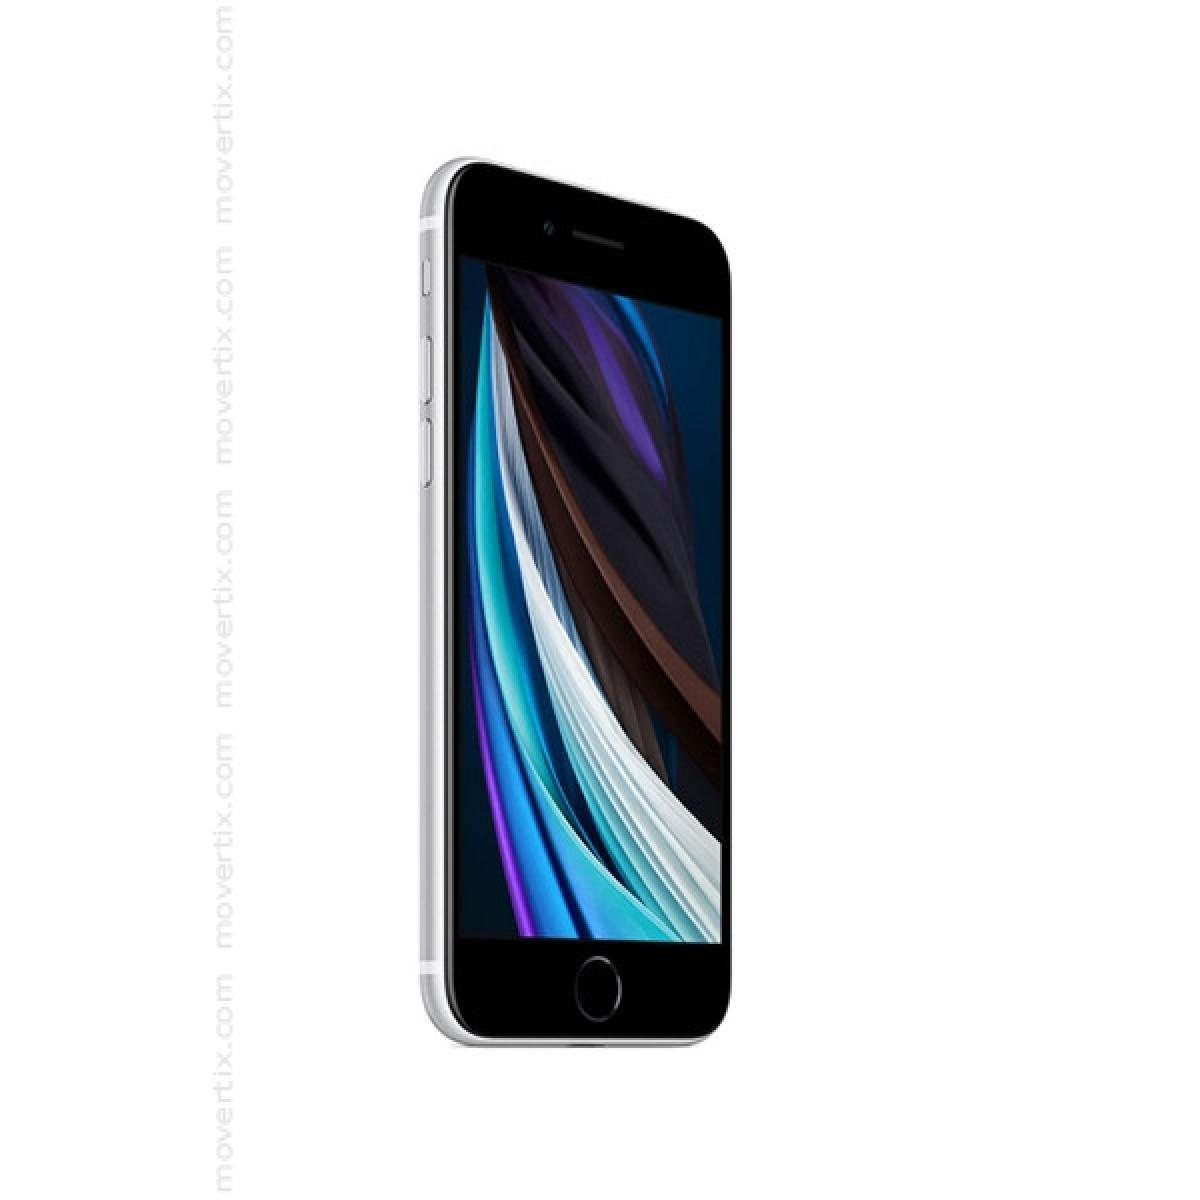 iPhone SE (2020) White 128GB (0190199505537) | Movertix ...